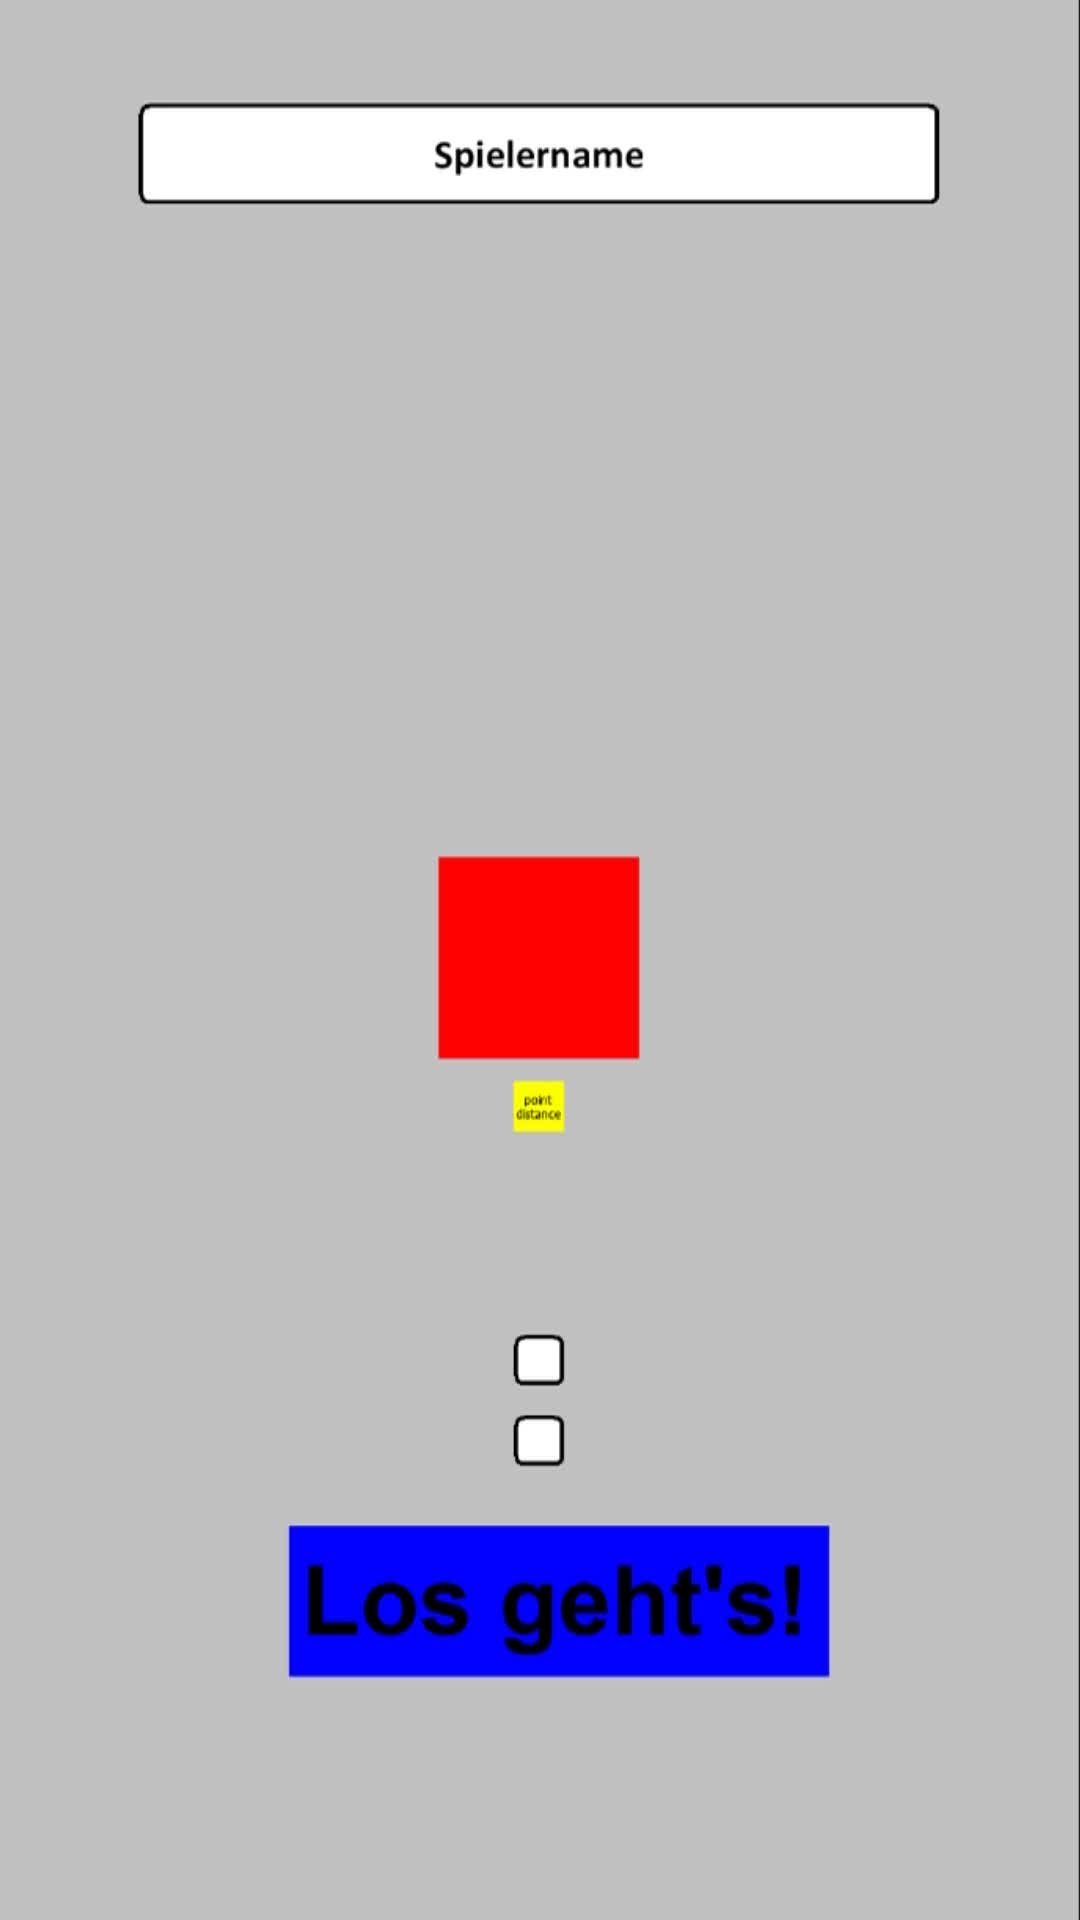 Gamemaker - Moving Keyboard GIFs